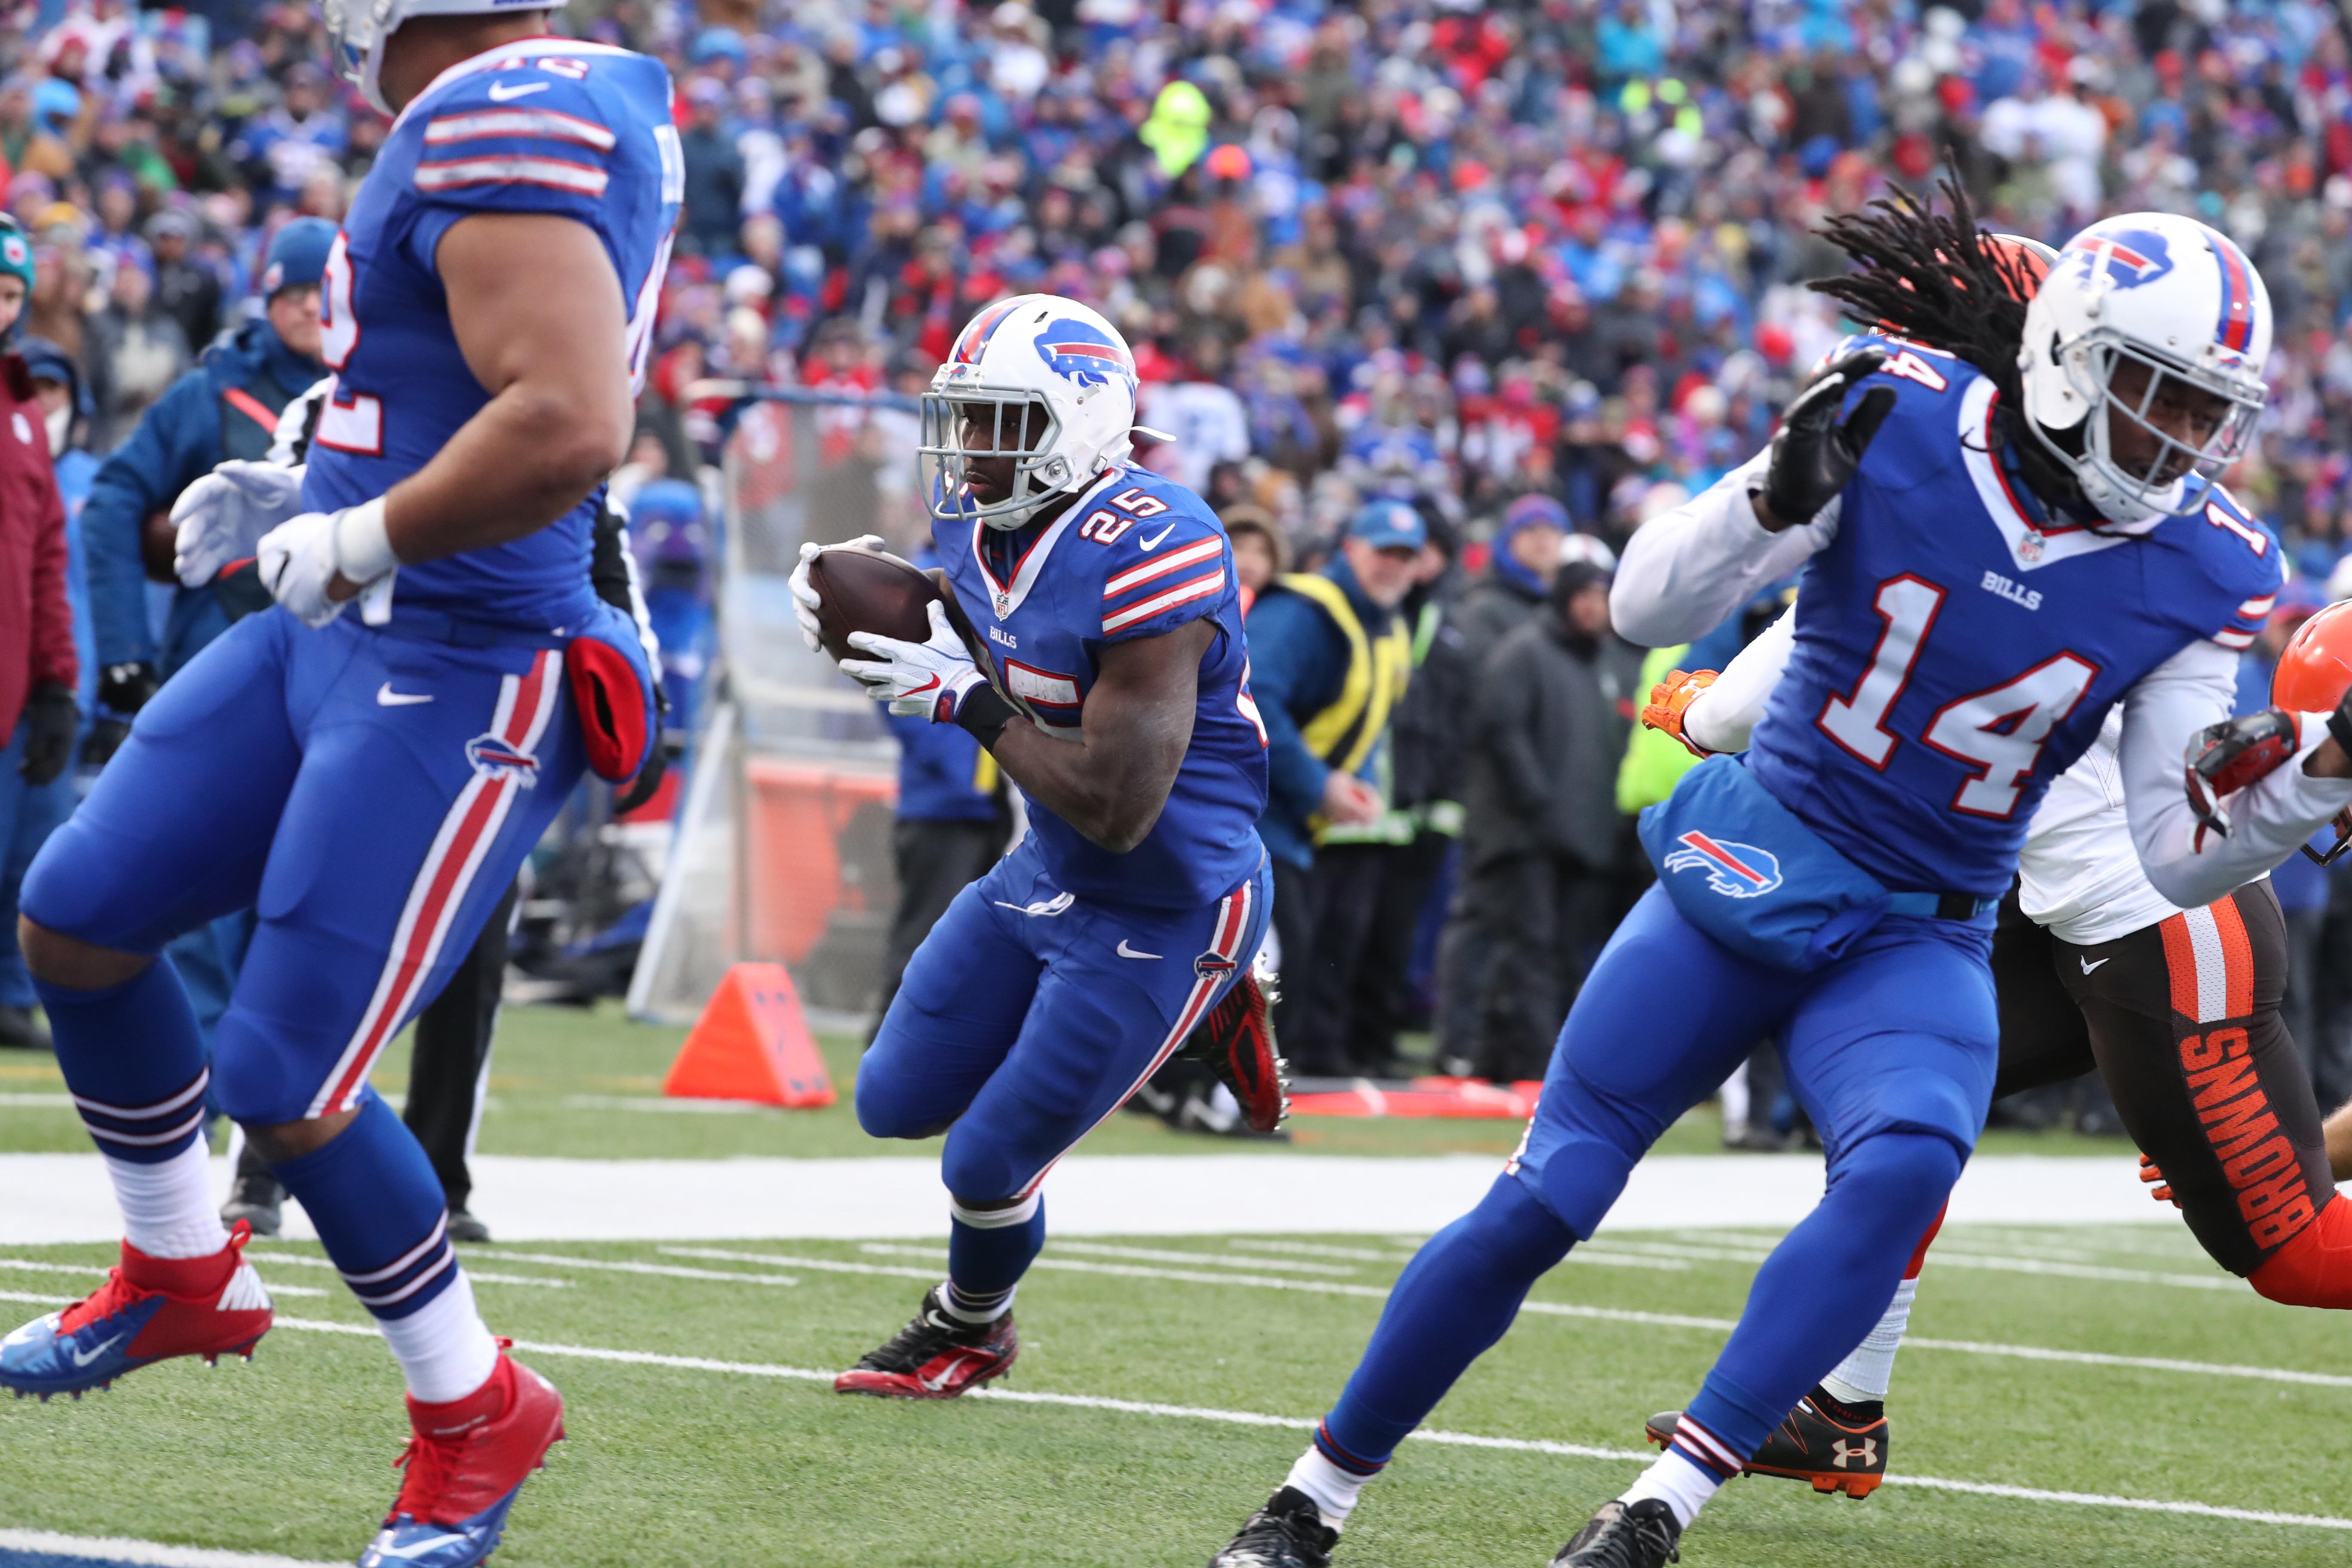 John Murphy wasn't as enthusiastic as expected on LeSean McCoy's first touchdown run. (James P. McCoy/Buffalo News)